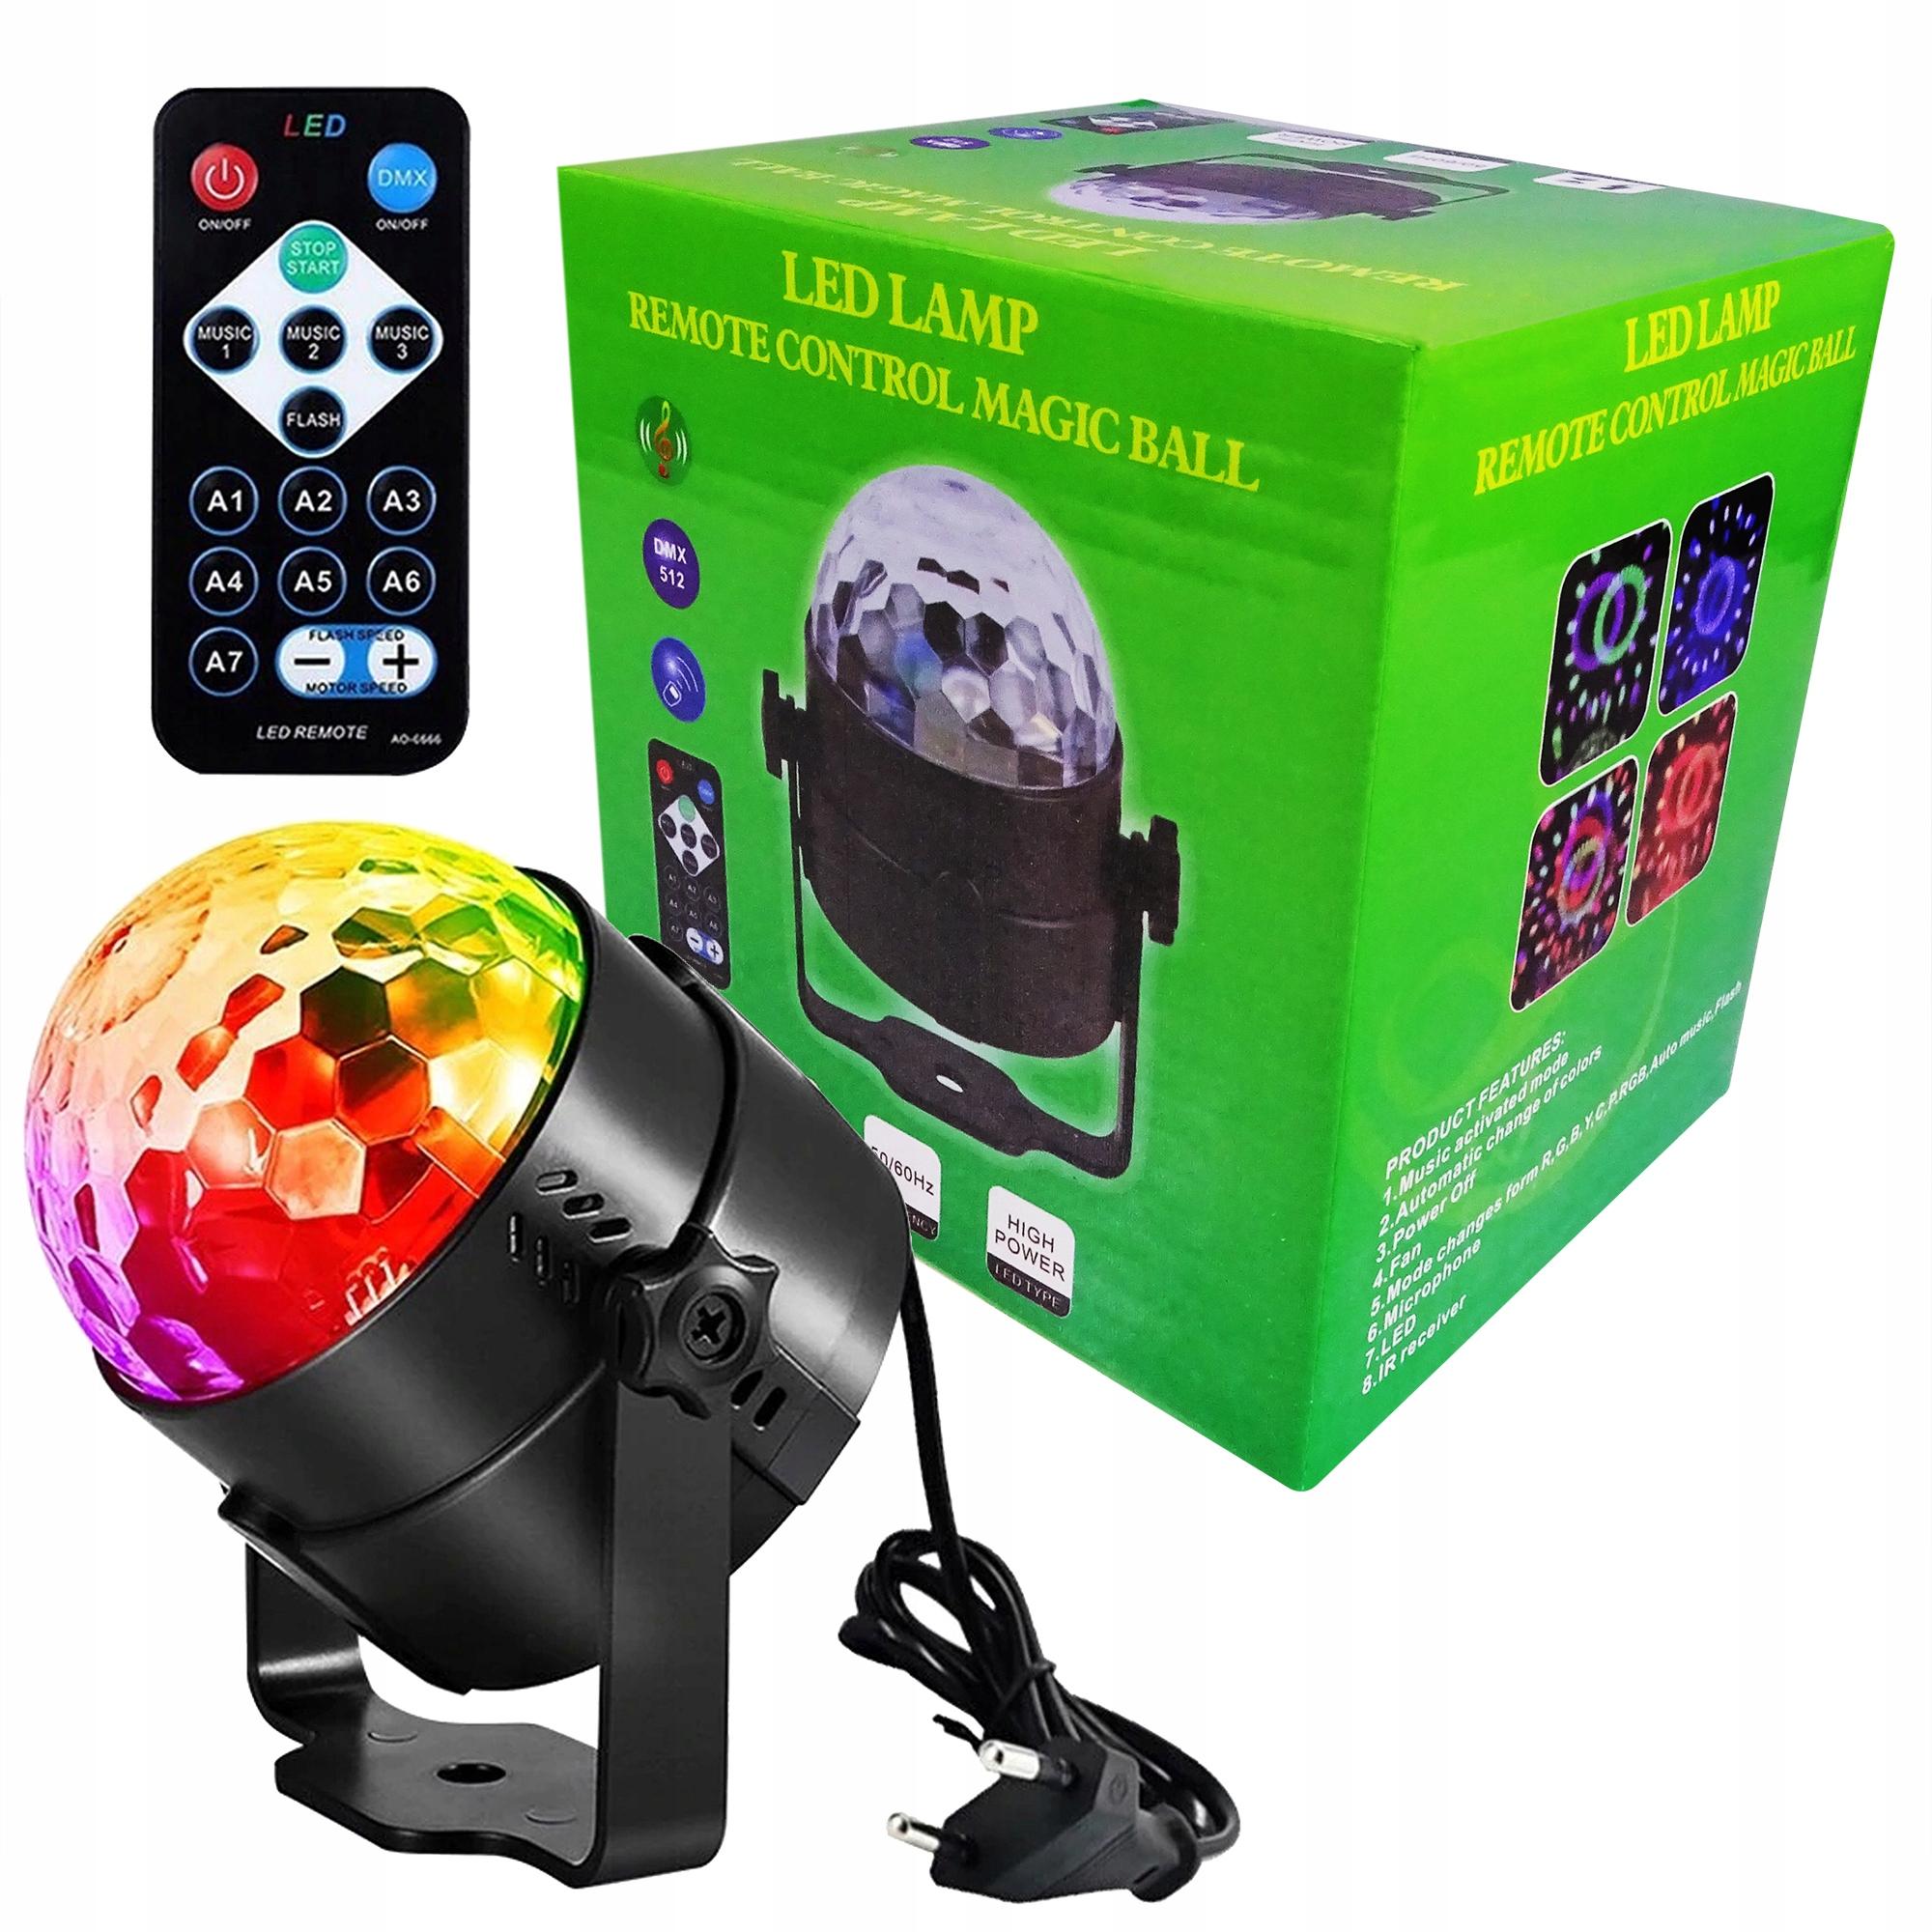 Item DJ DISCO BALL LIGHT BALL RGB LED FLOODLIGHT REMOTE CONTROL